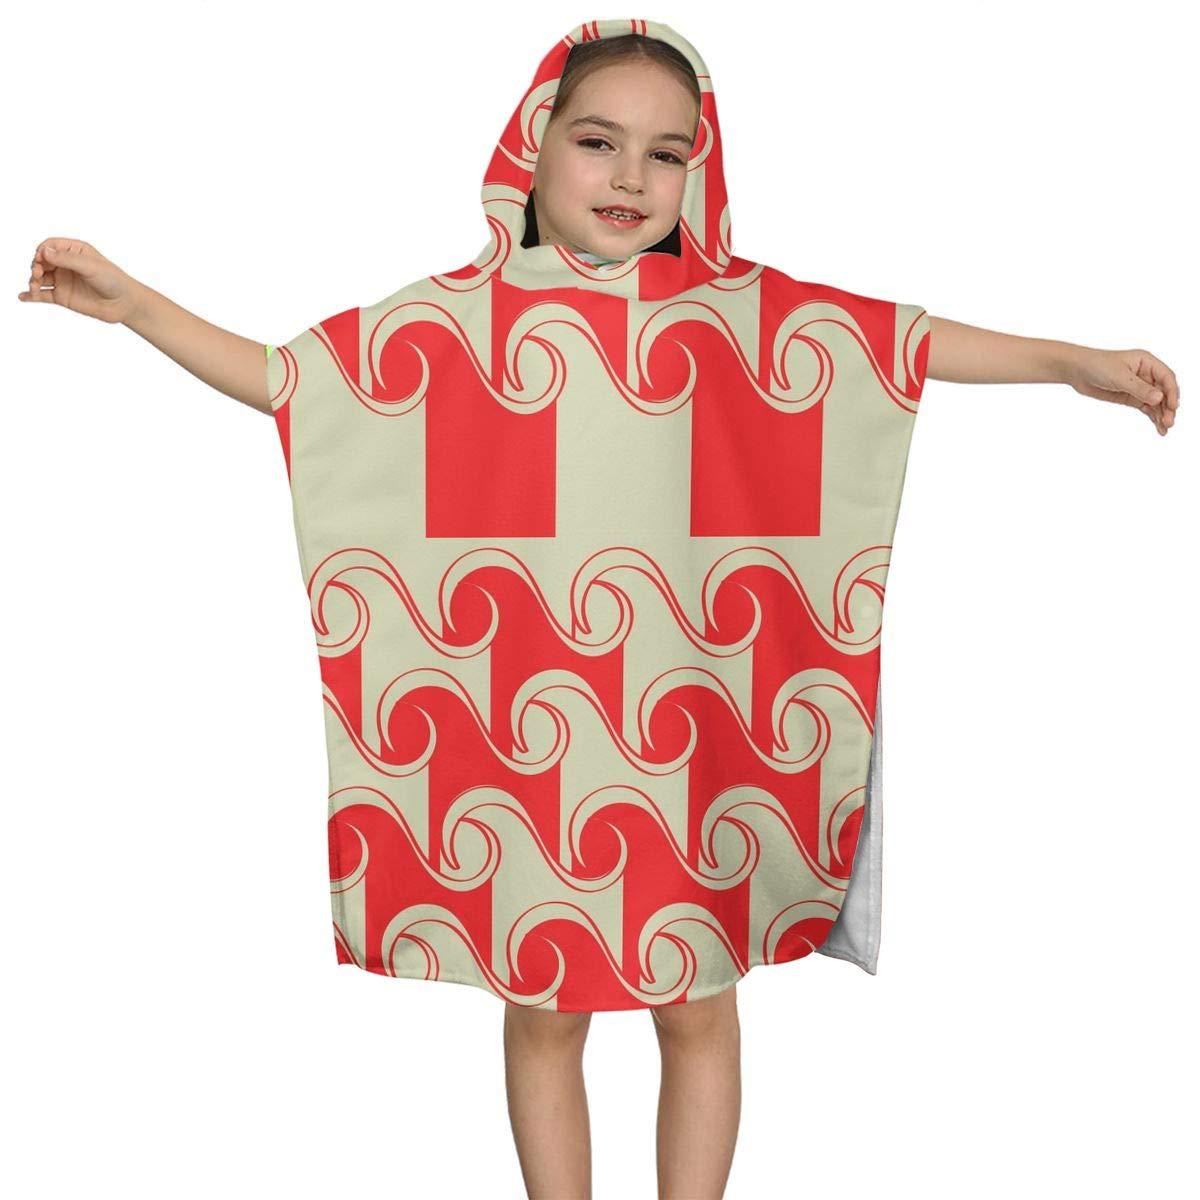 DE Xin Trade Red Water Ocean Sea Kids Hooded Beach Bath Towel Use for Baby Toddler Boys Bath Pool Swim Poncho Cover-ups for All Seasons Soft Beach 2-7 Years Old Bath Robe Girls